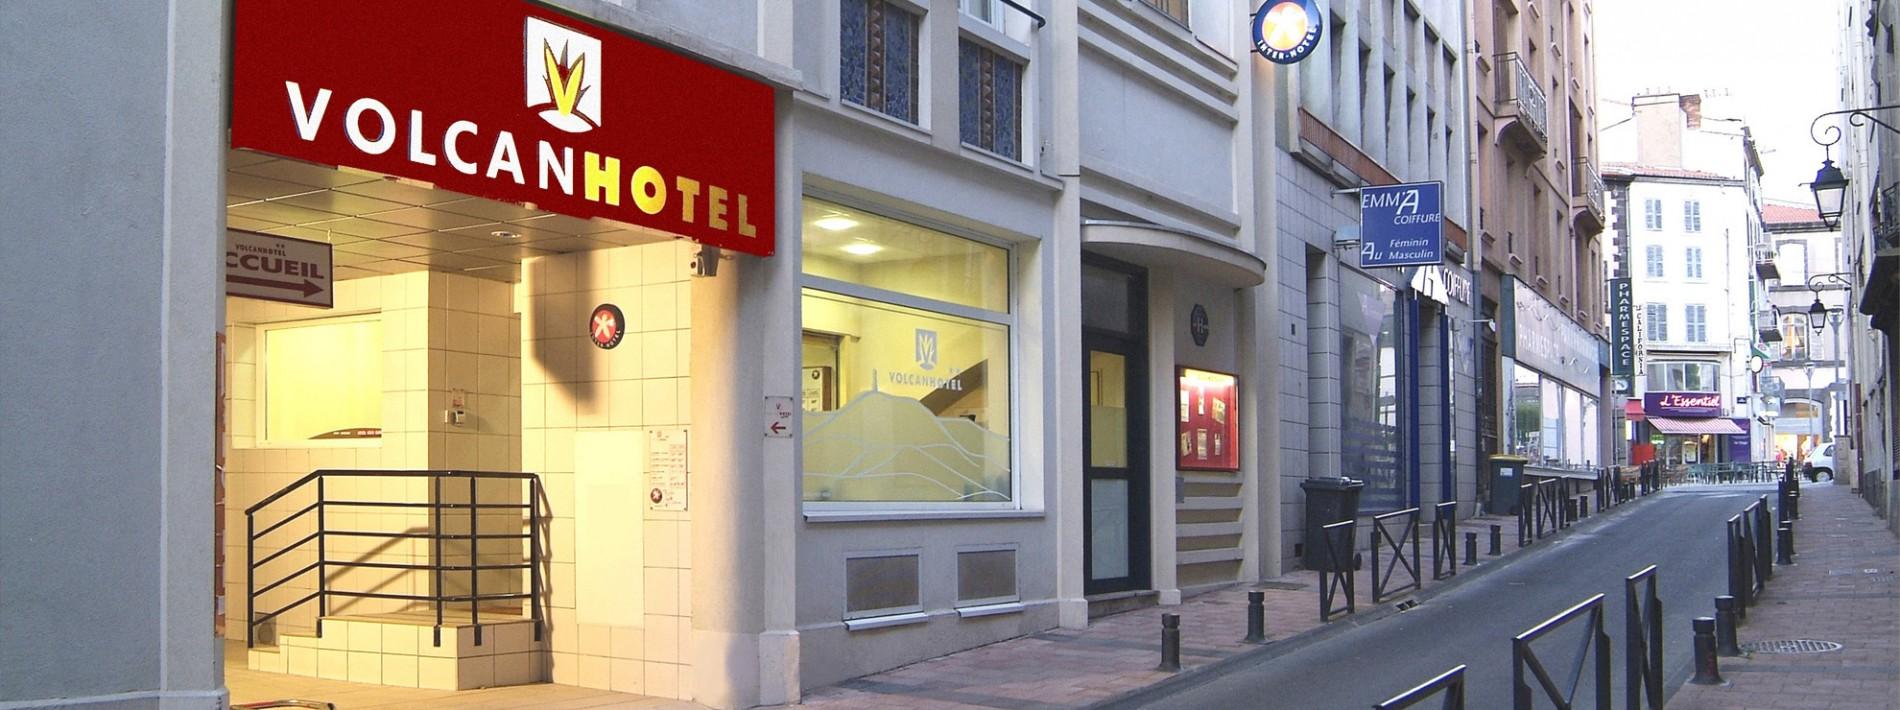 hotel-clermont-ferrand-volcan-hotel-1